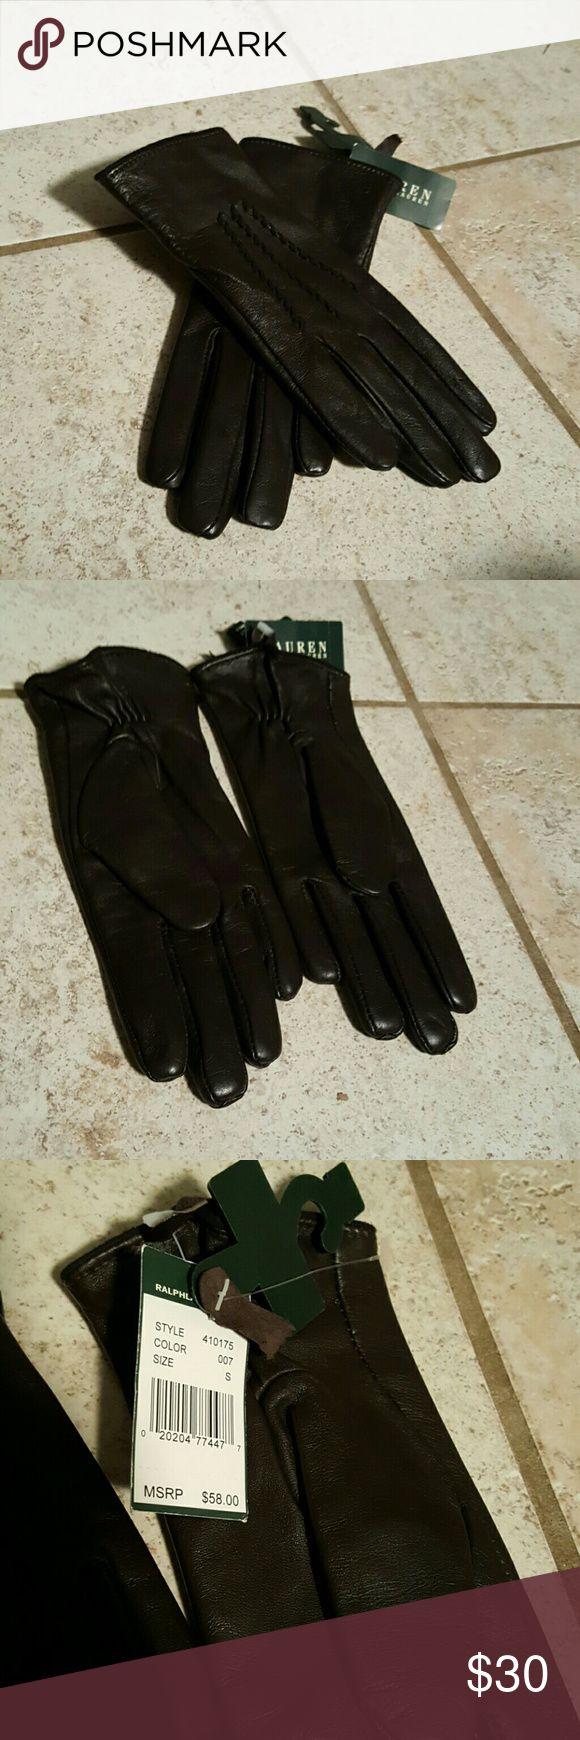 Ralph Lauren leather gloves New never been worn. Size small. Ralph Lauren brown leather gloves. Lauren Ralph Lauren Accessories Gloves & Mittens